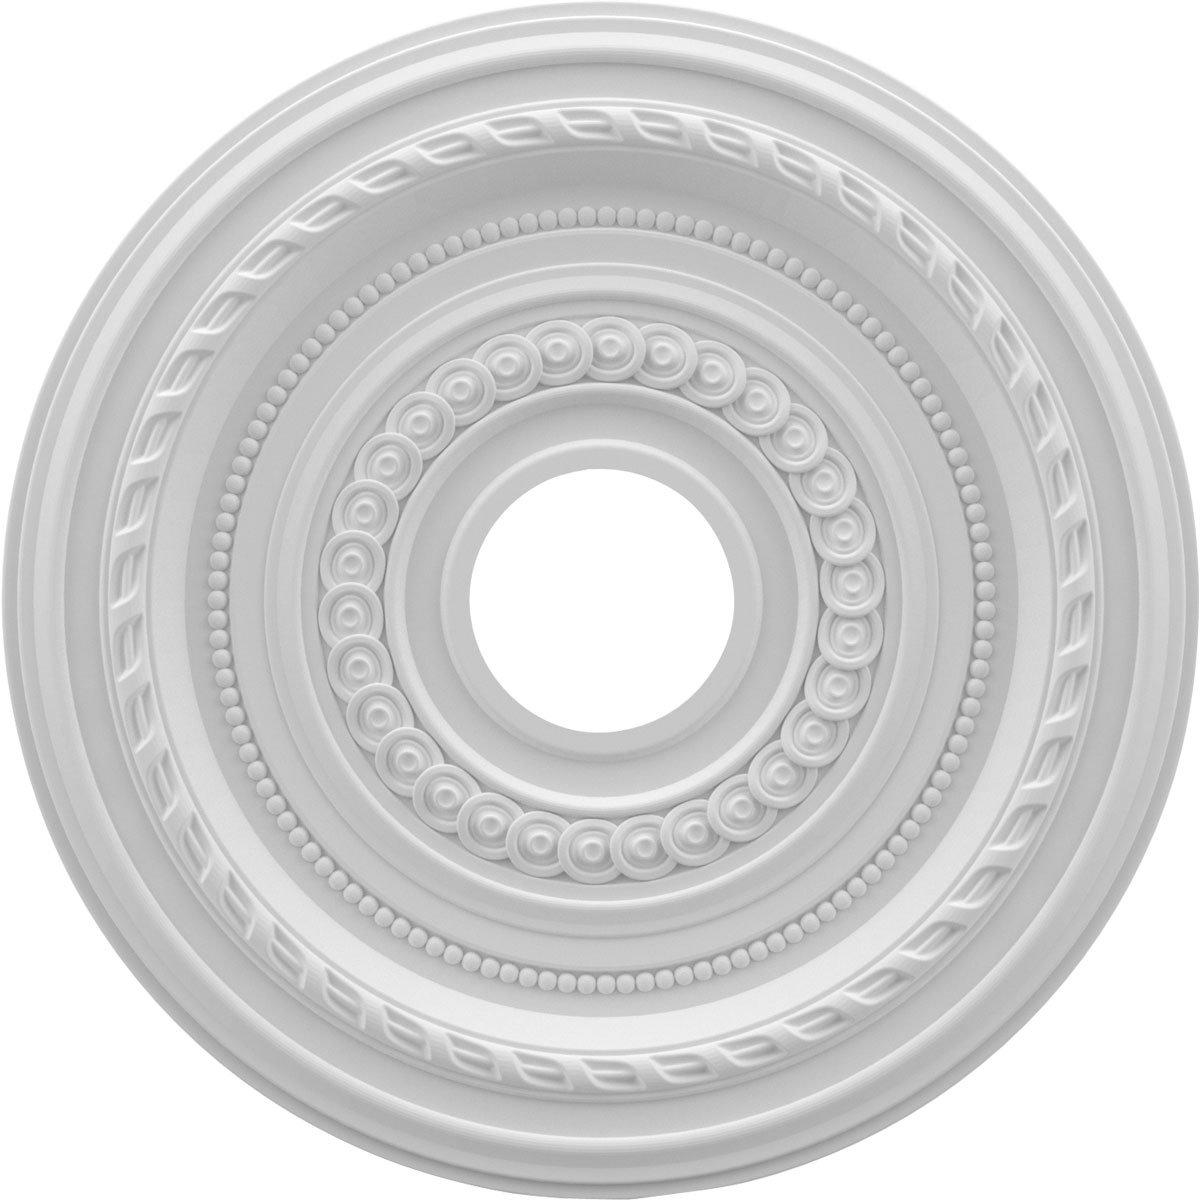 Ekena CMP16CO Ceiling Medallion, Primed White, 16' OD x 3 1/2' ID x 1' P 16 OD x 3 1/2 ID x 1 P Ekena Millwork